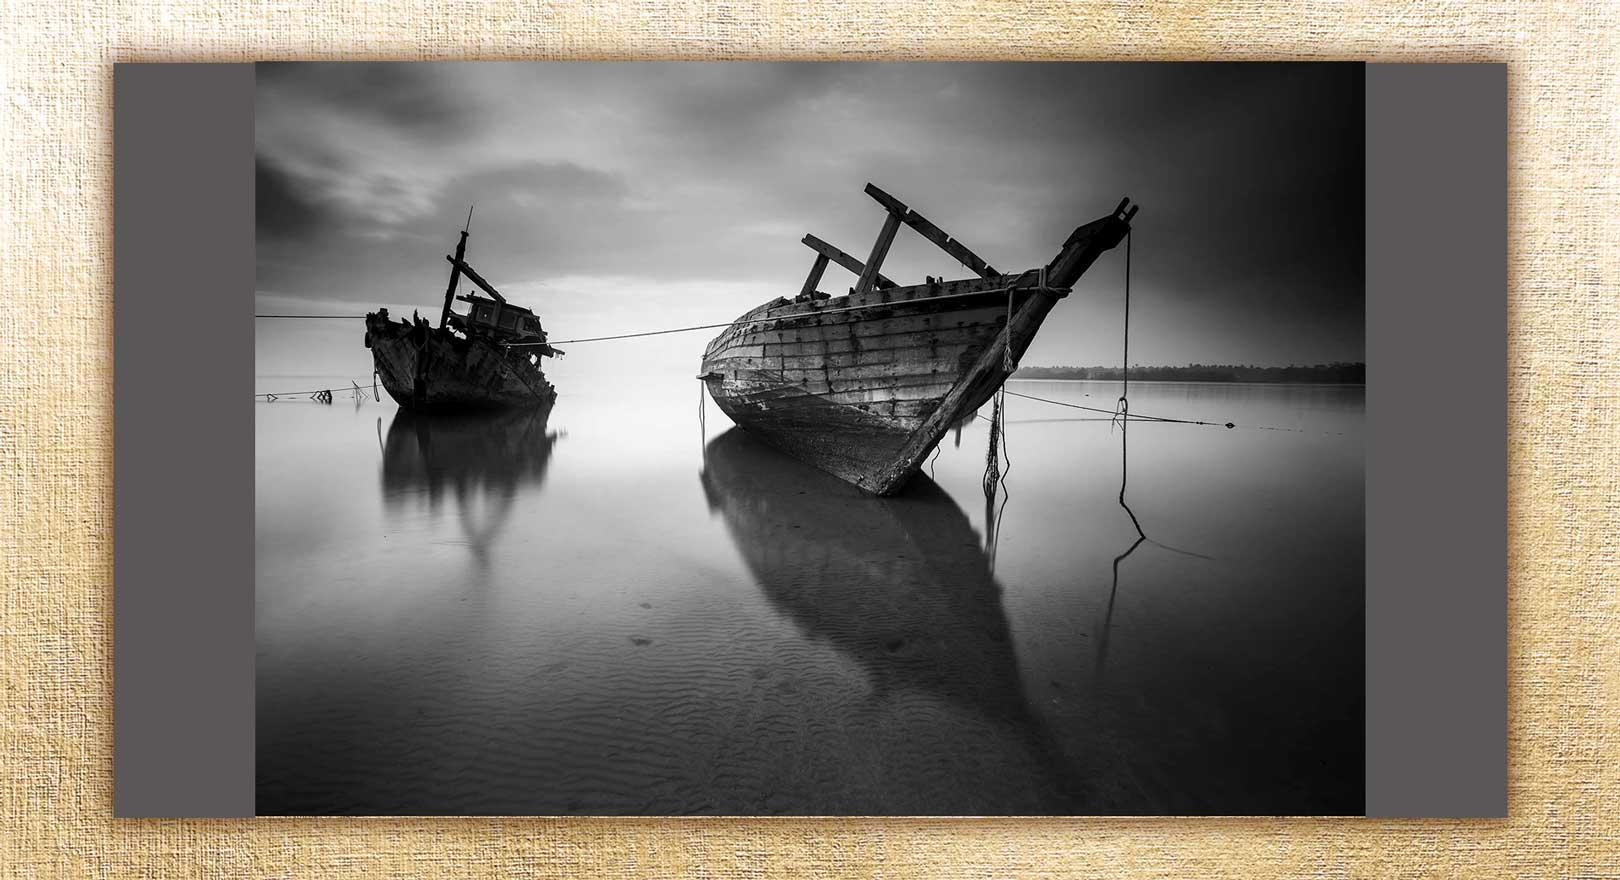 Good   photo  12jpg - عناصر عکاسی : سه عنصر سازنده یک عکس خوب